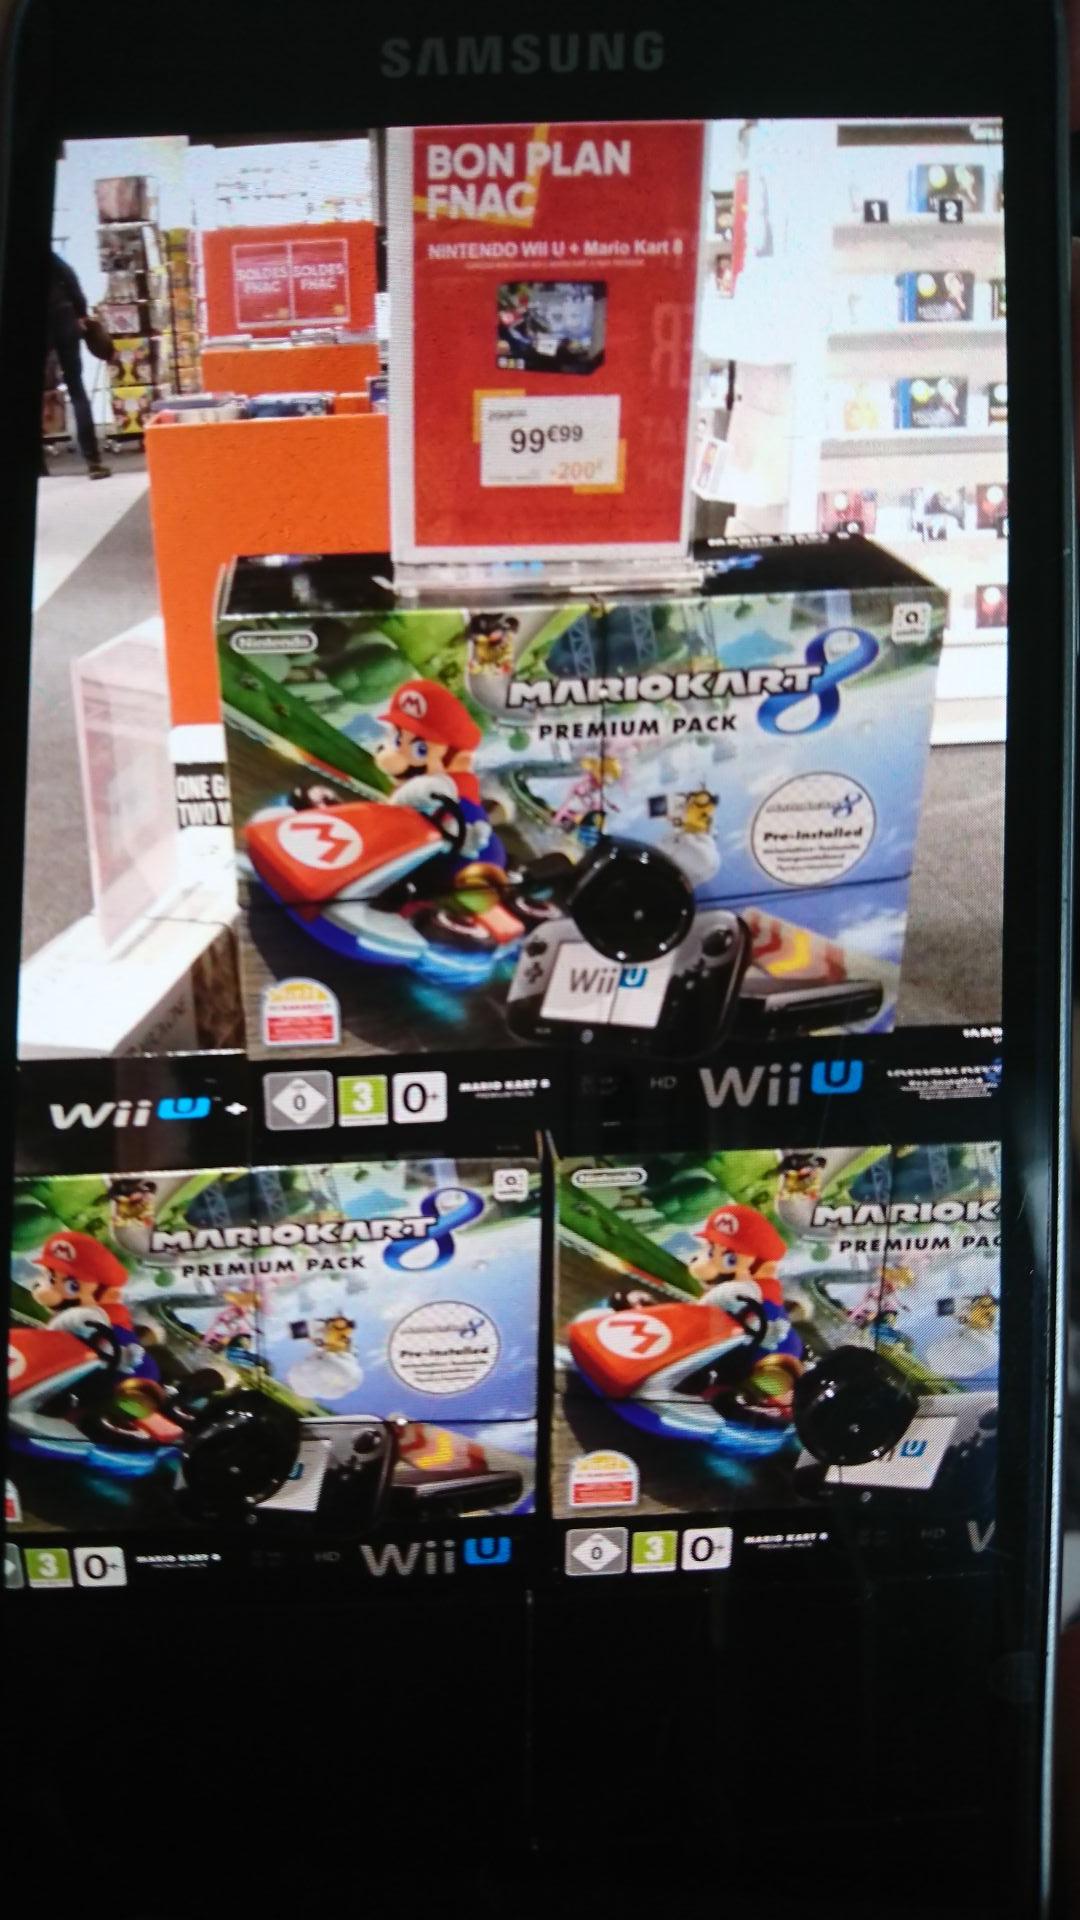 Pack console Wii U + Mario Kart - Saint Nazaire (44)